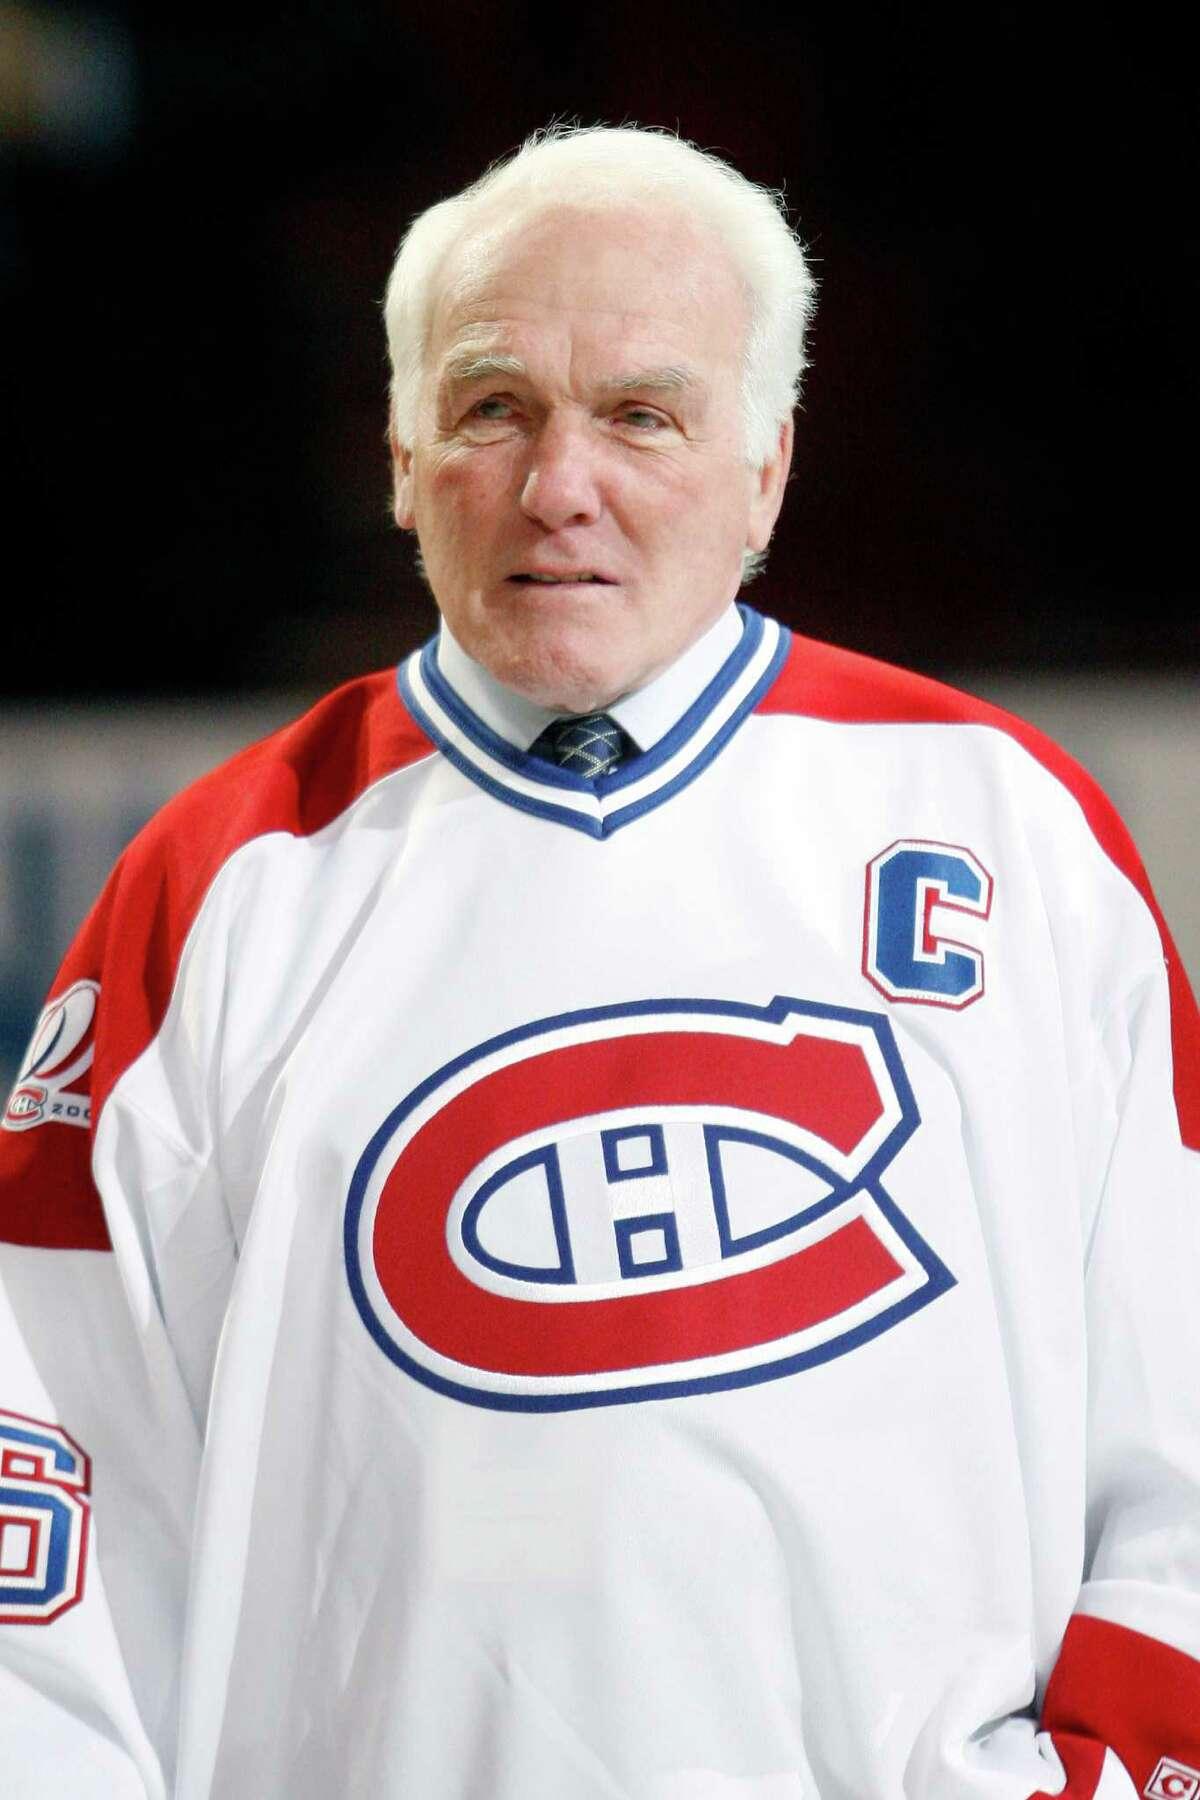 1936 Hockey Hall of Famer Henri